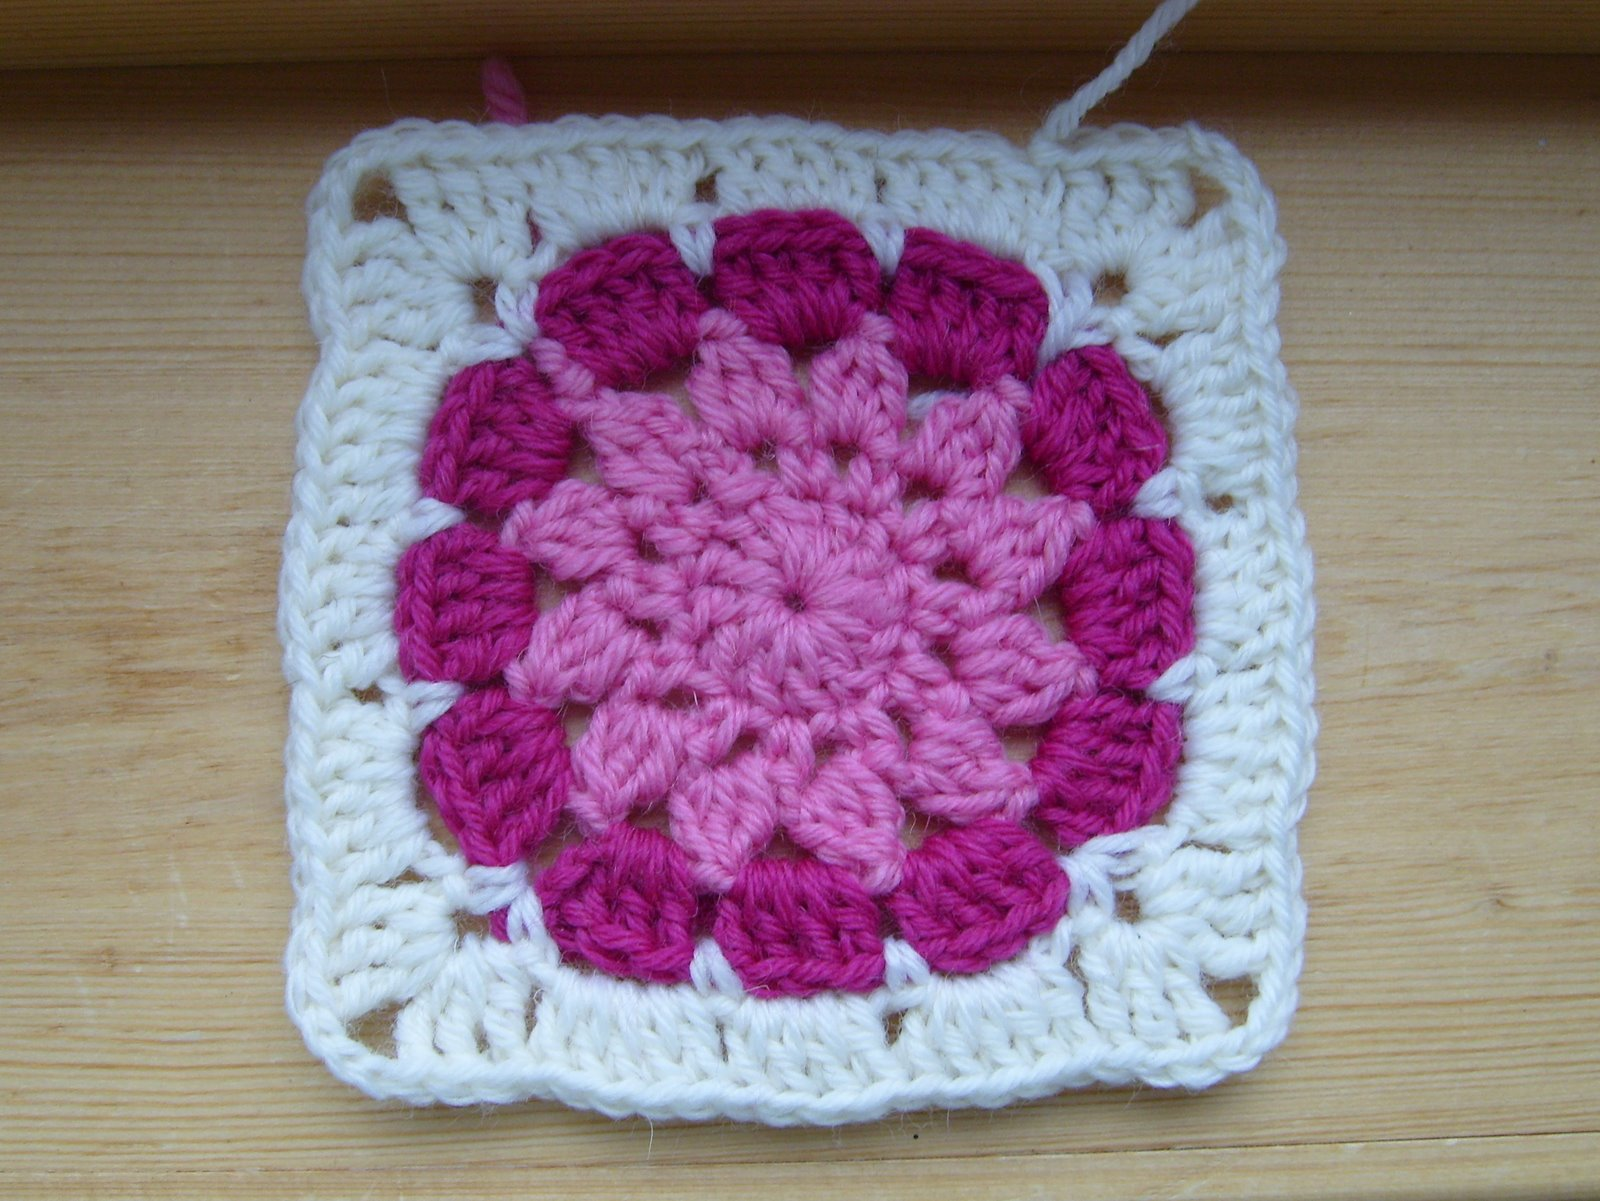 Crocheting Squares : Renees Crochet: Crochet Squares...